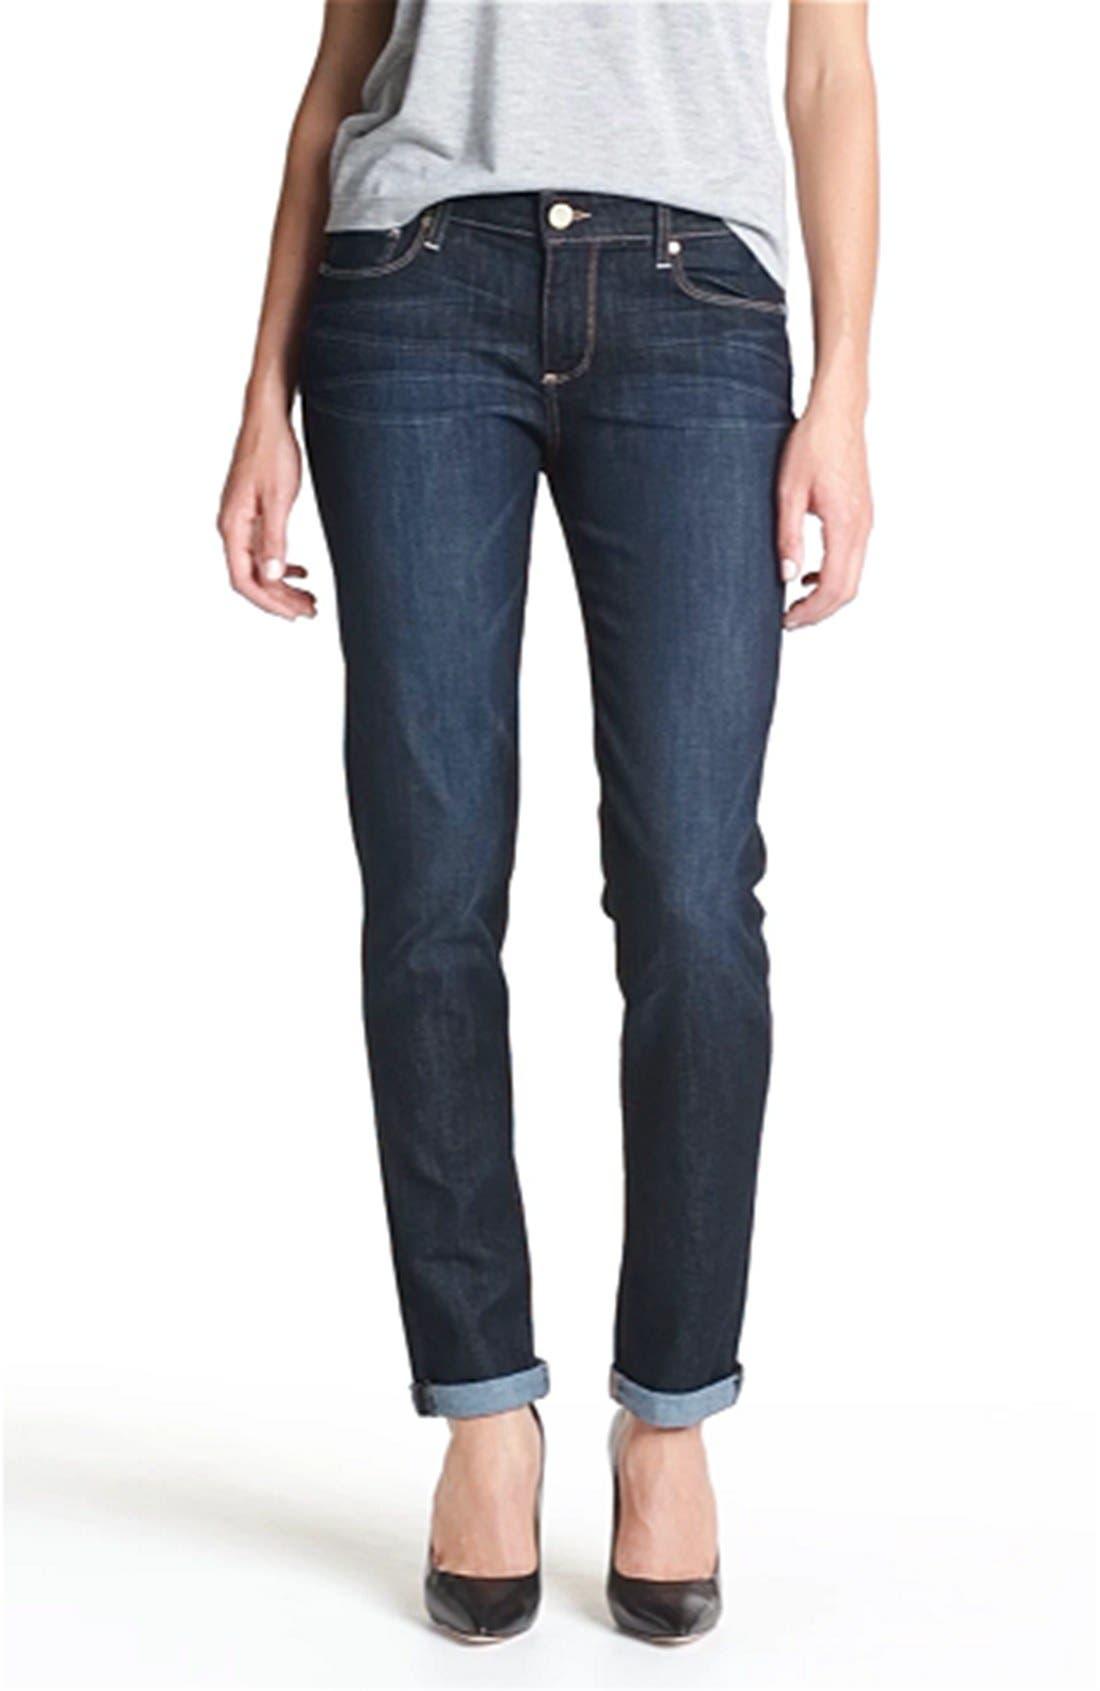 PAIGE, Denim 'Jimmy Jimmy' Stretch Jeans, Alternate thumbnail 3, color, 410